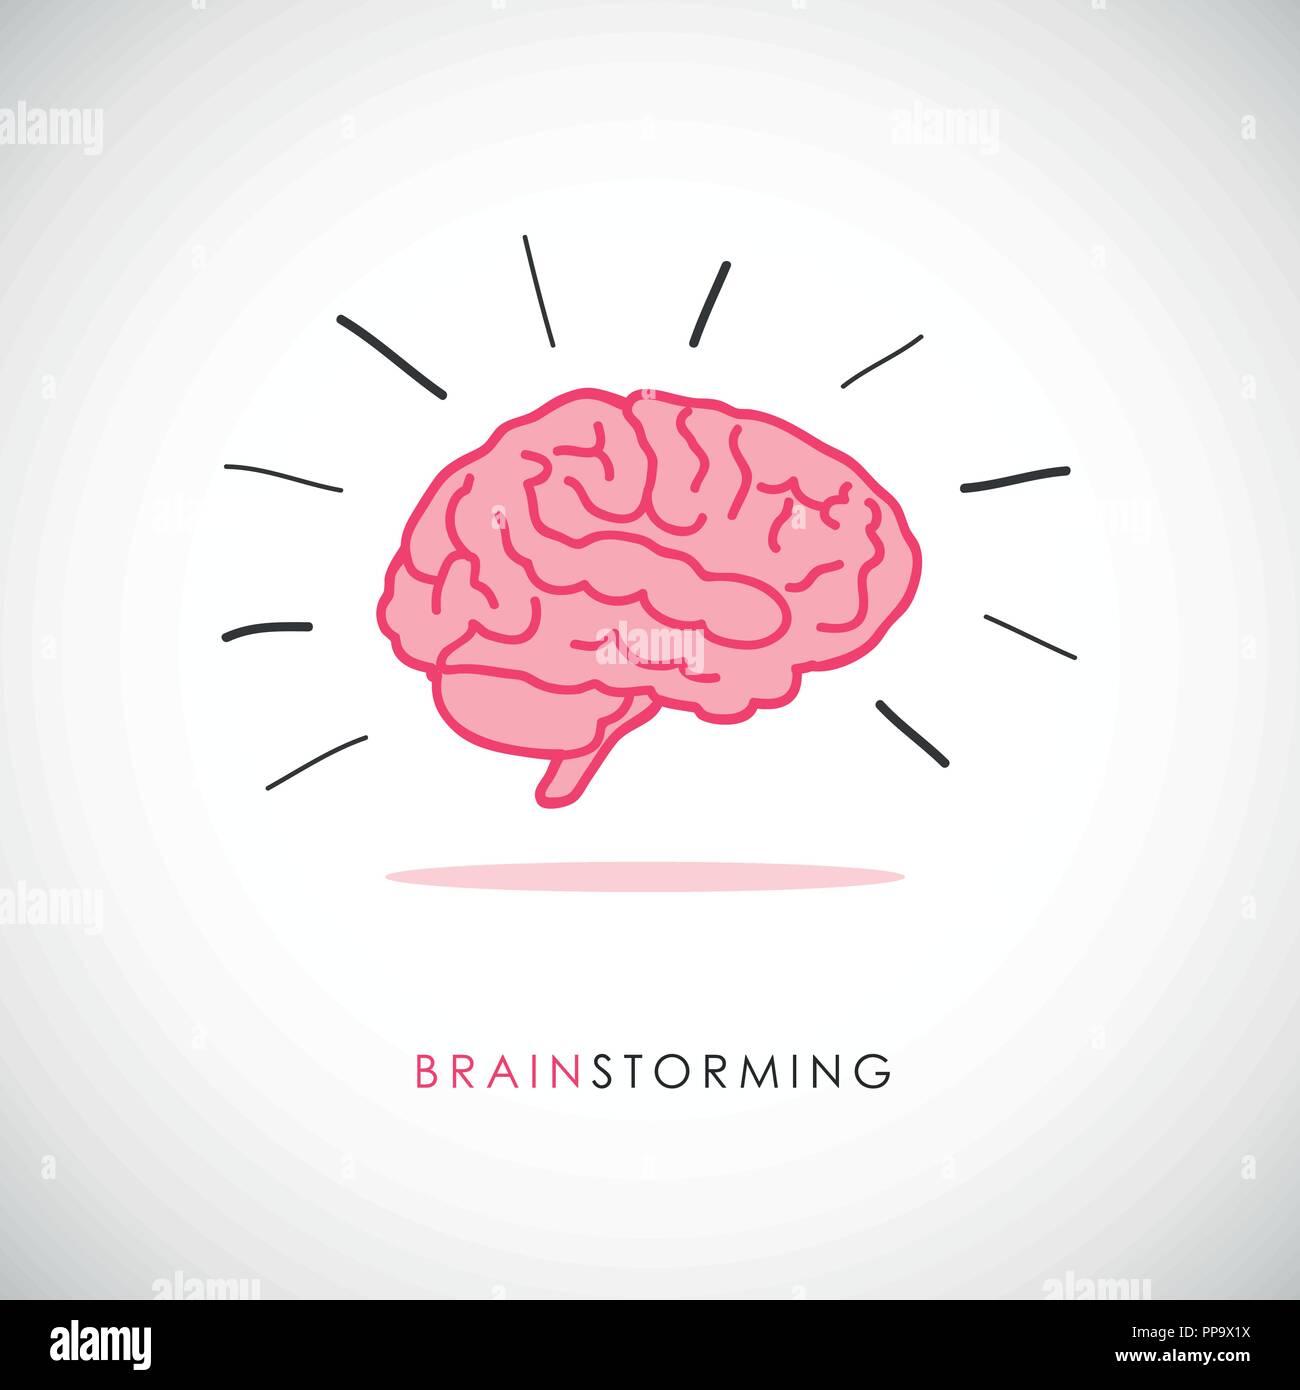 human brain icon brainstorming concept vector illustration - Stock Image